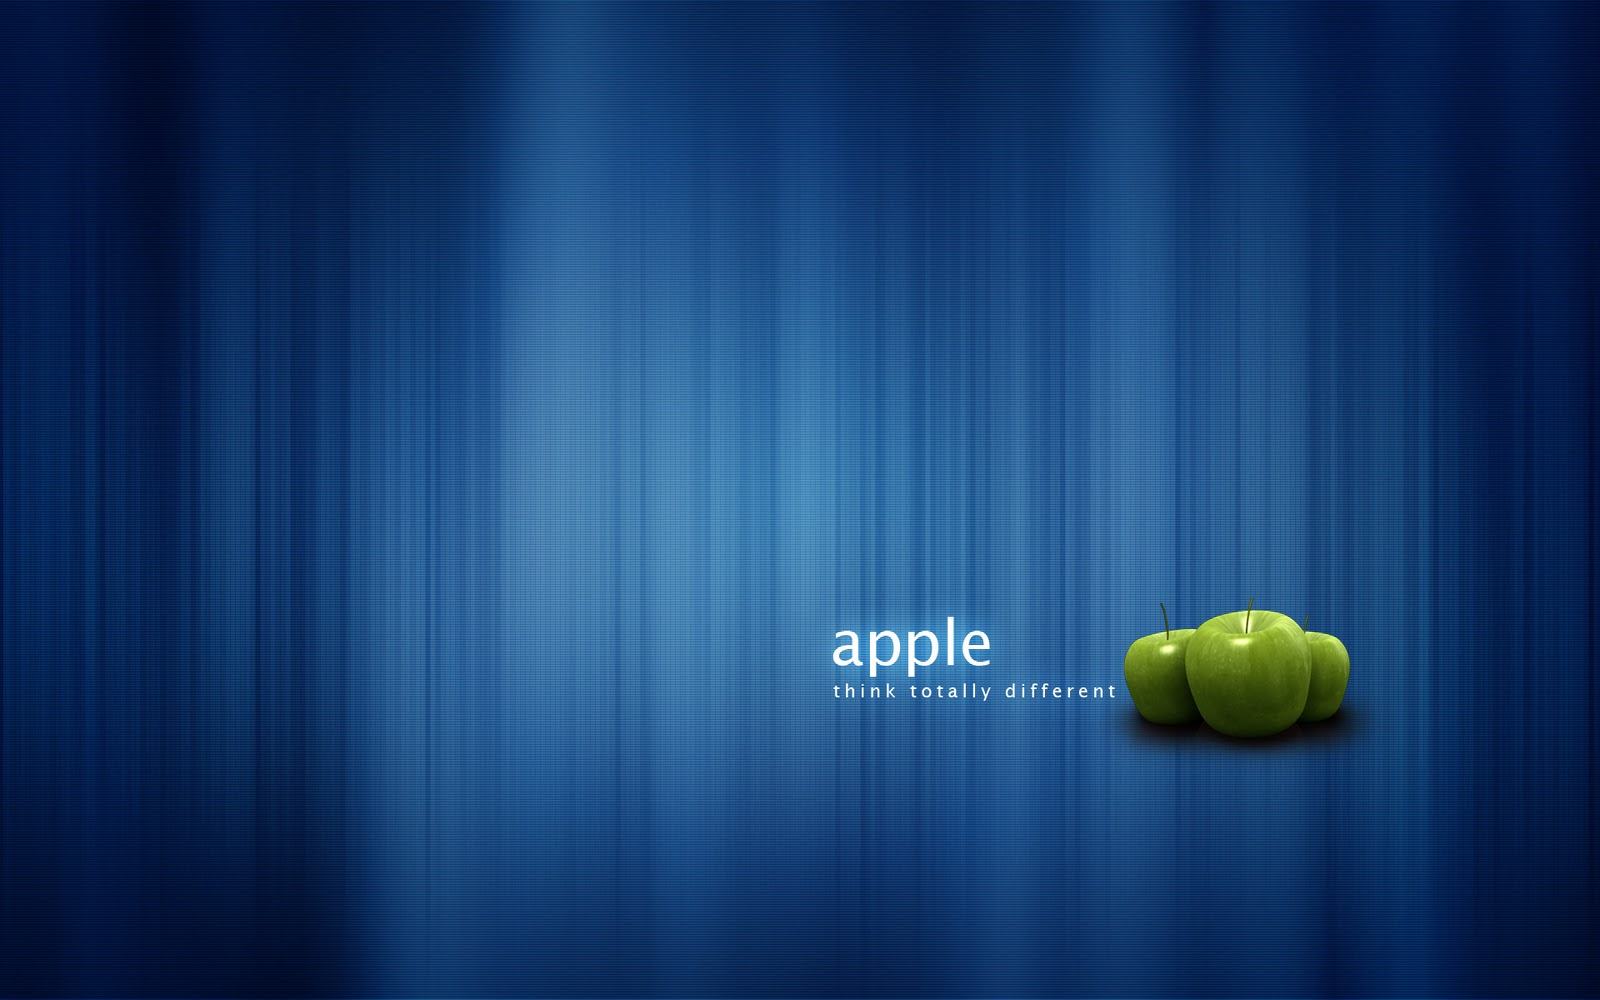 Best desktop hd wallpaper apple hd wallpapers for Wallpaper companies